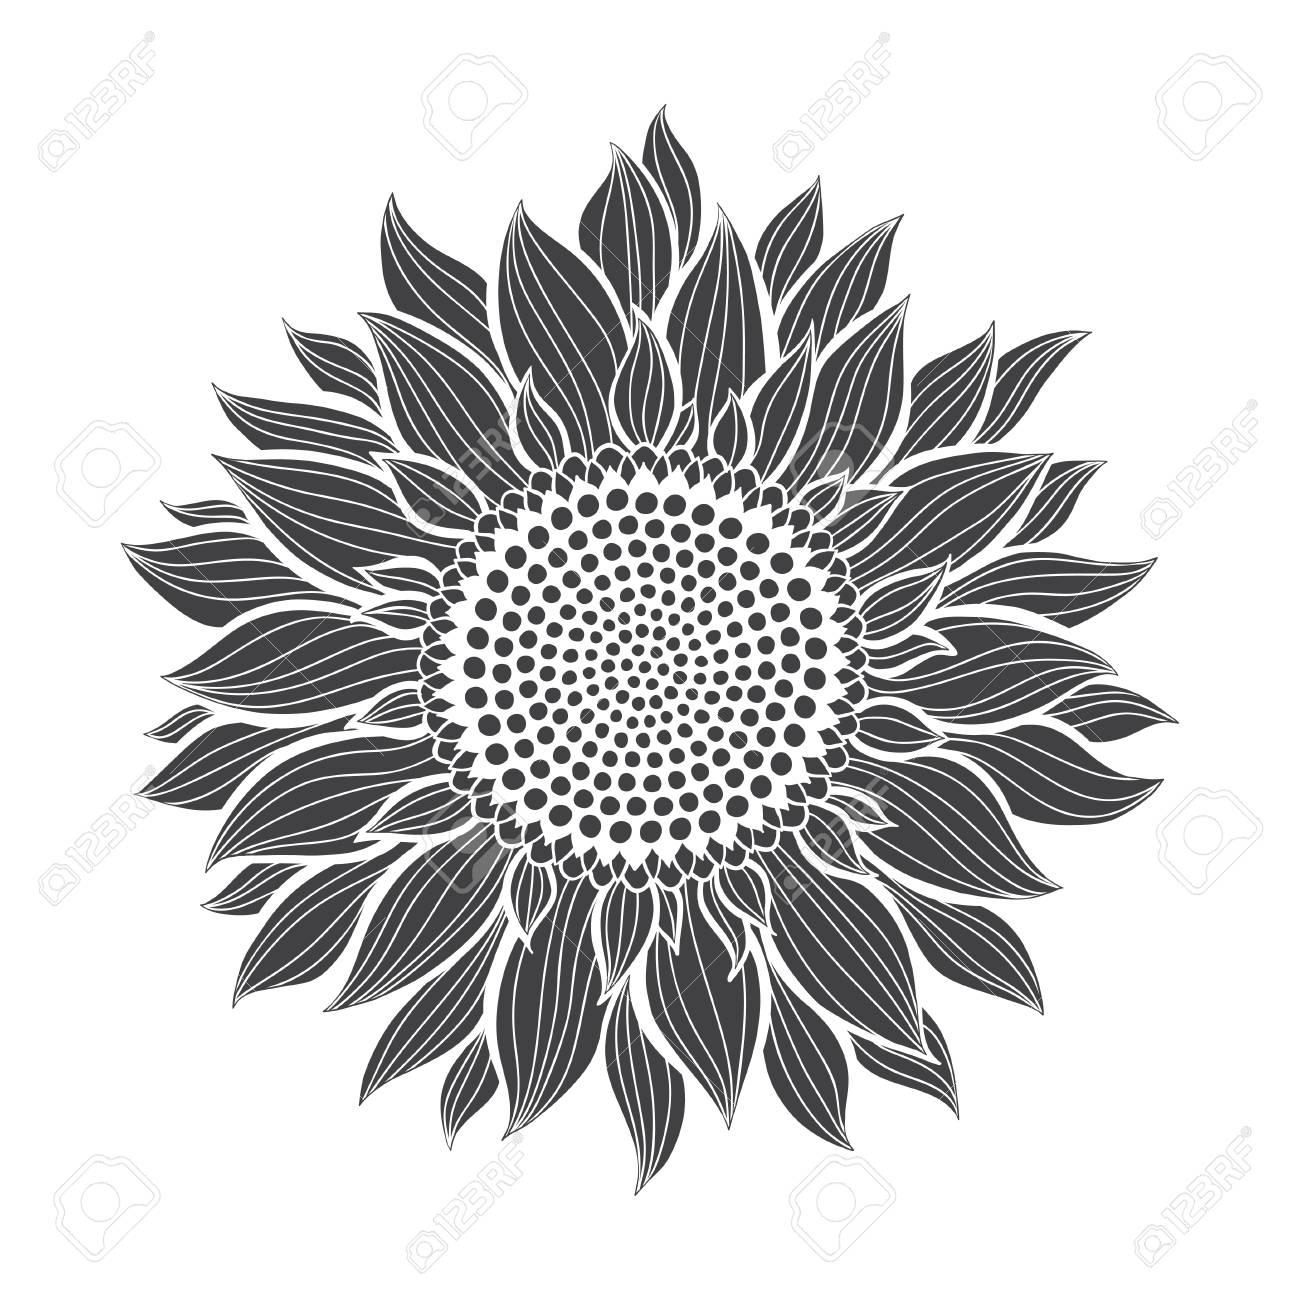 Sunflowers isolated on white background. Botanical vector illustration. Silhouette. - 113541249